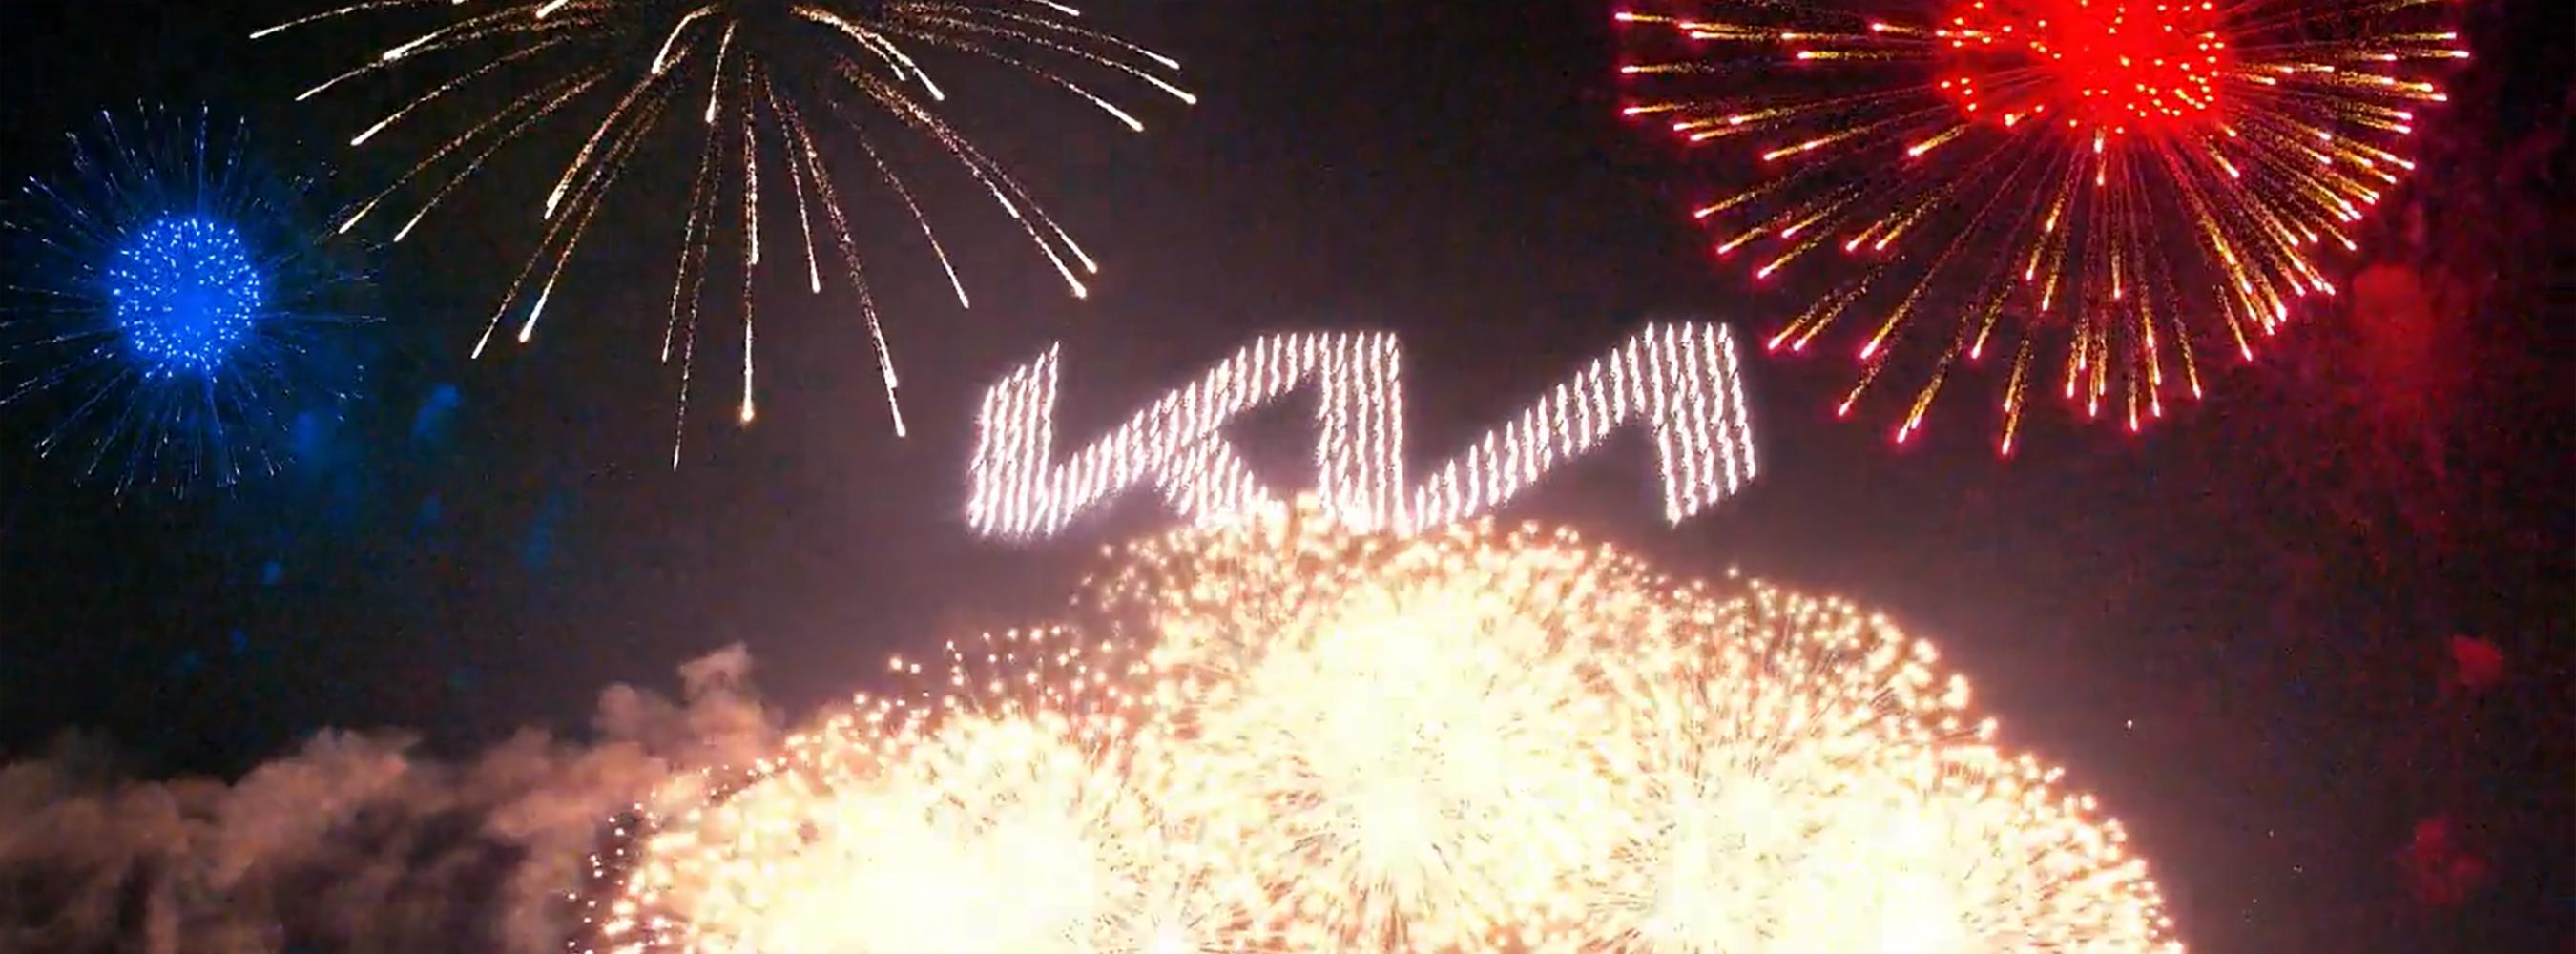 Kia unveils new logo and global brand slogan to ignite its bold...